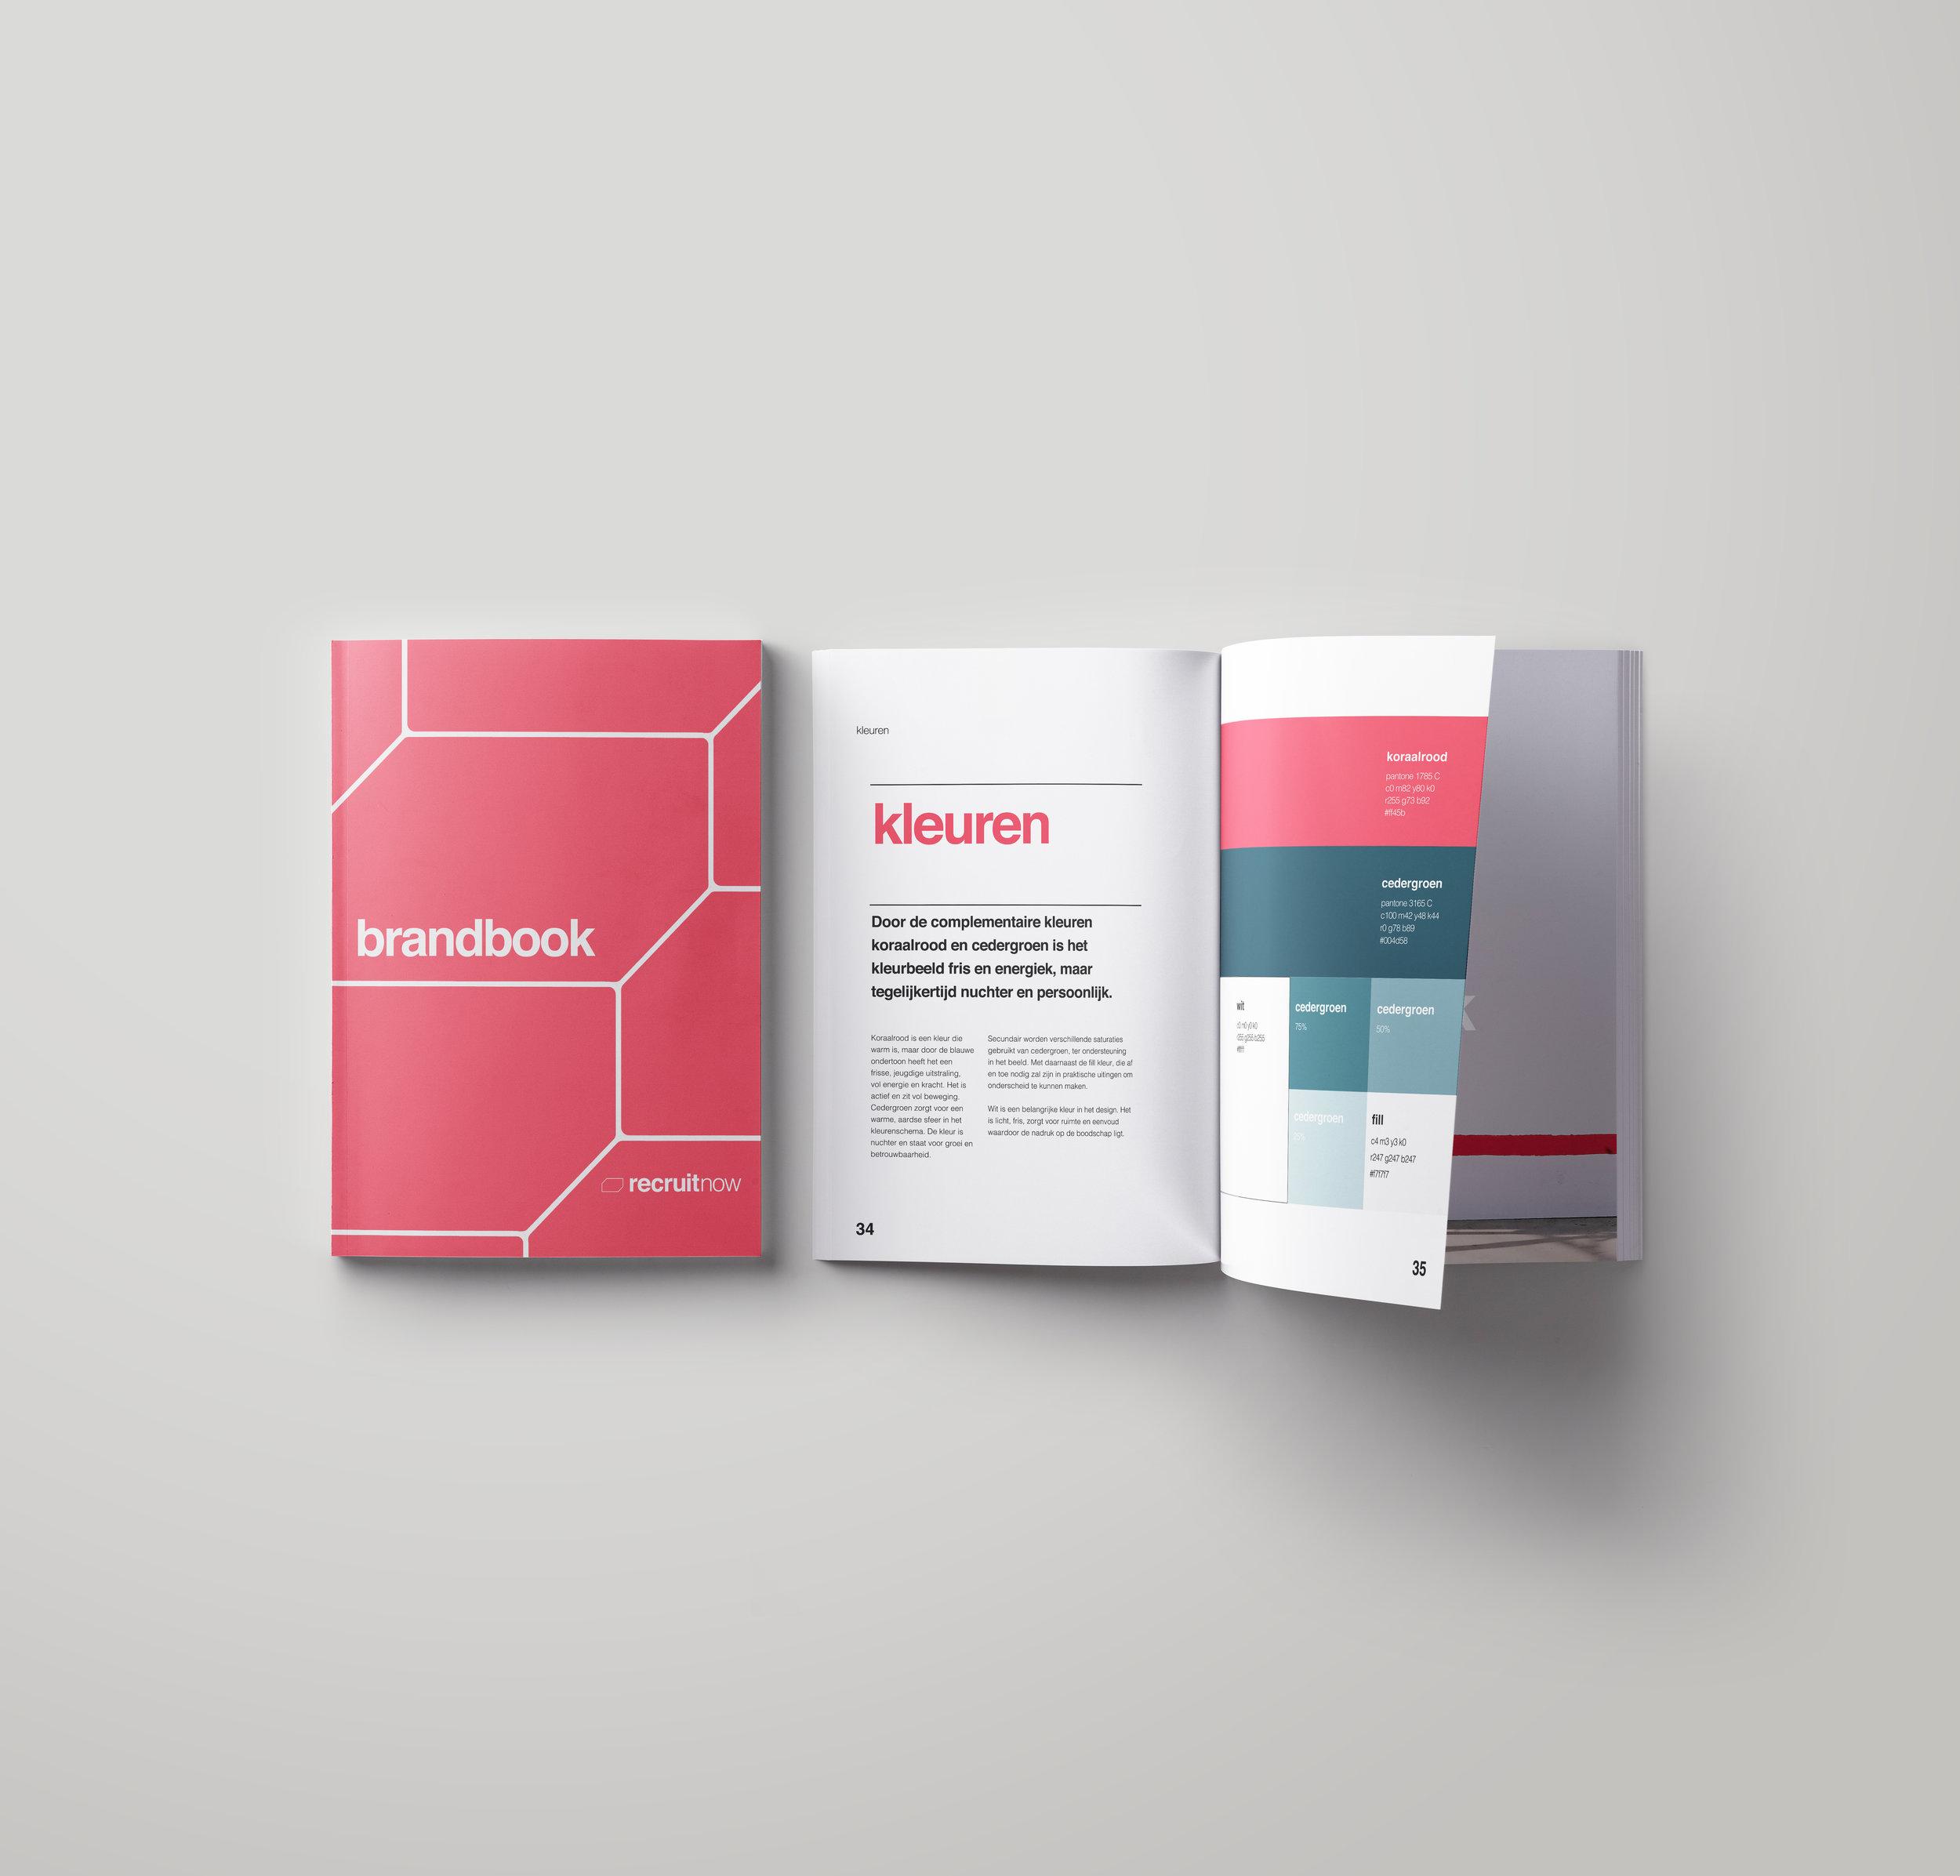 recruit-now-brand-book-marketing-schmarketing